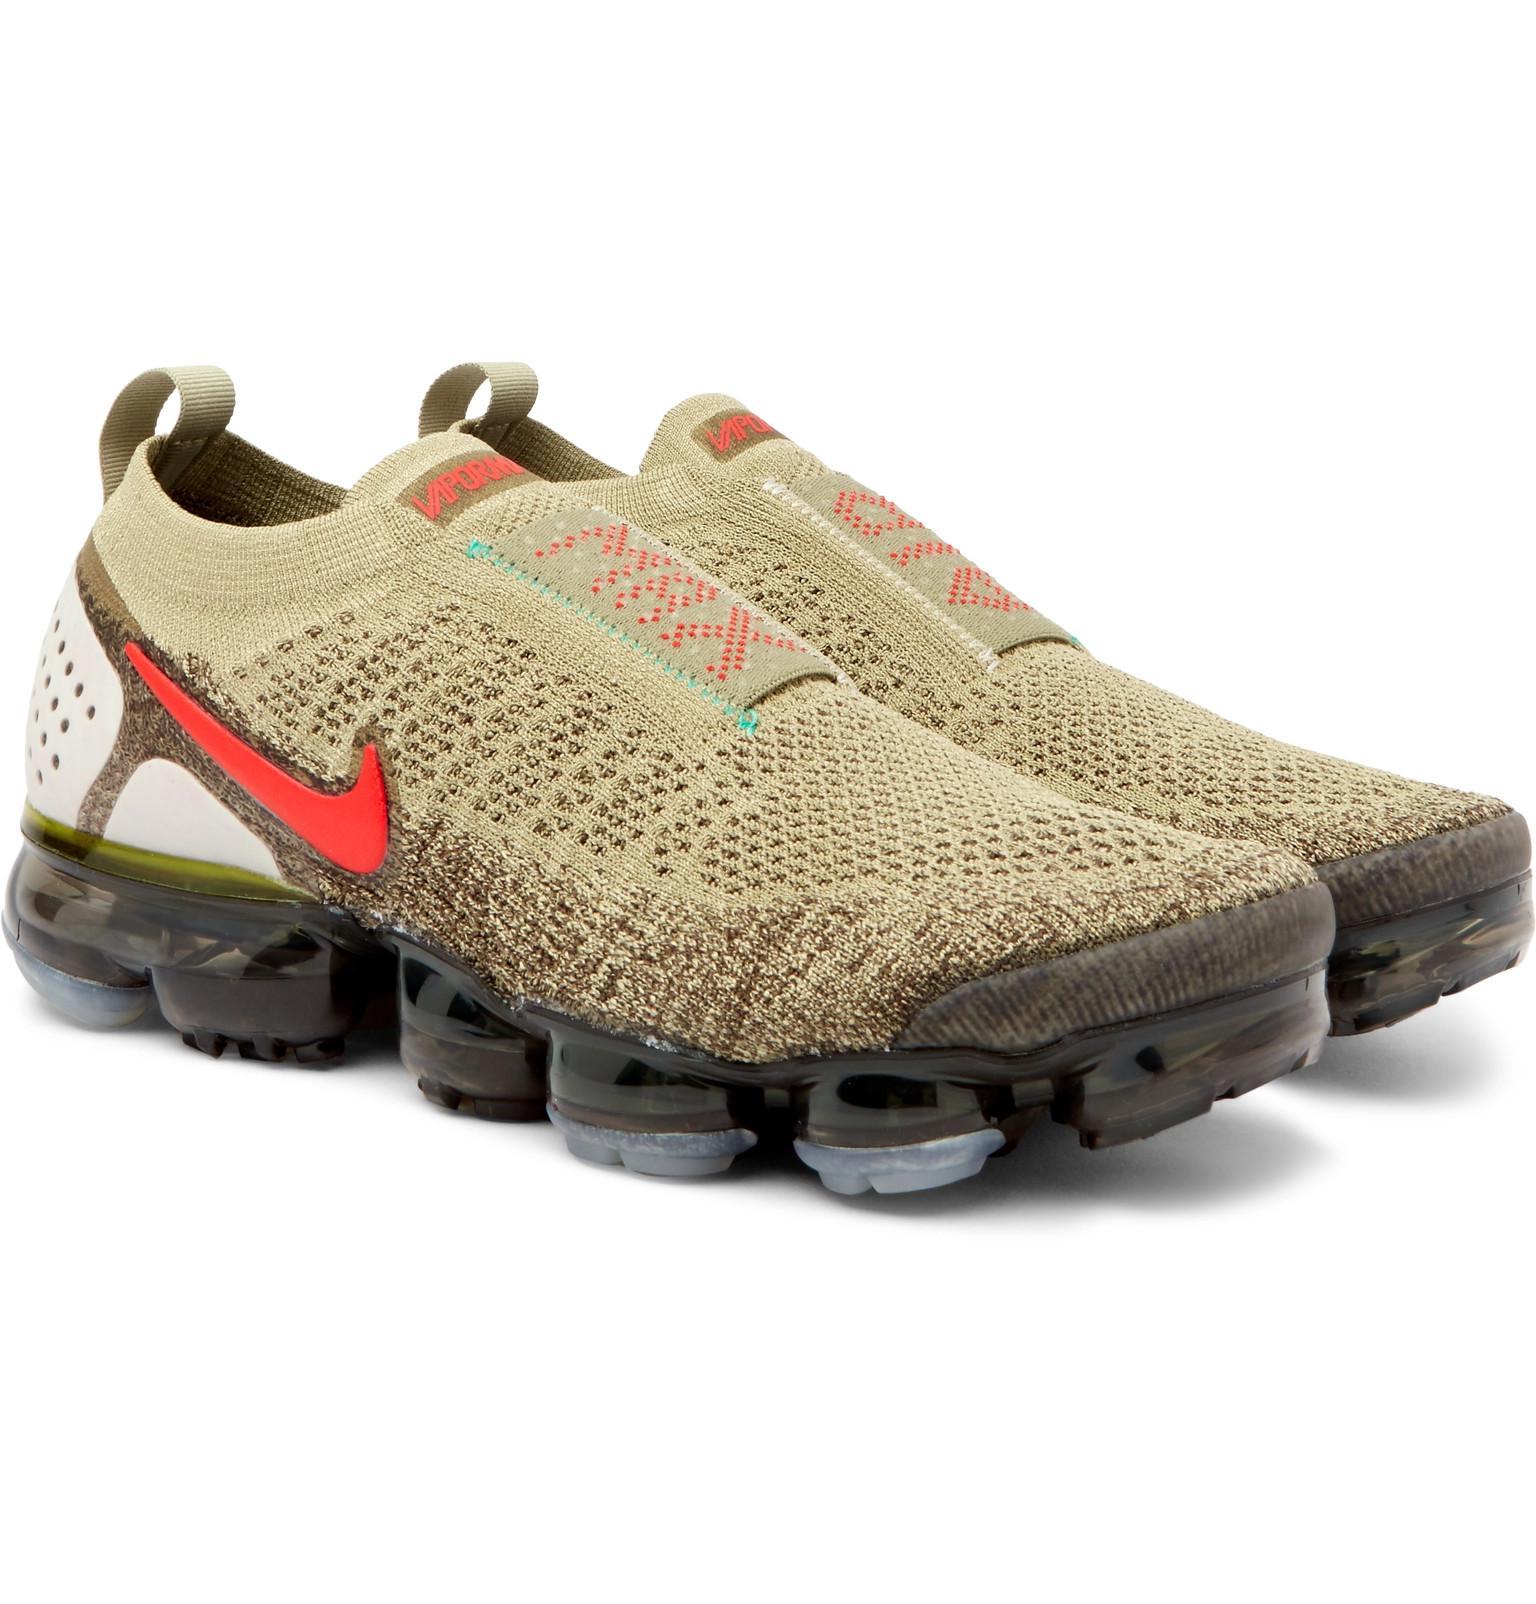 6wgqhv Moc Air Slip 2 Vapormax On Nike Flyknit Sneakers Green 4qOzc